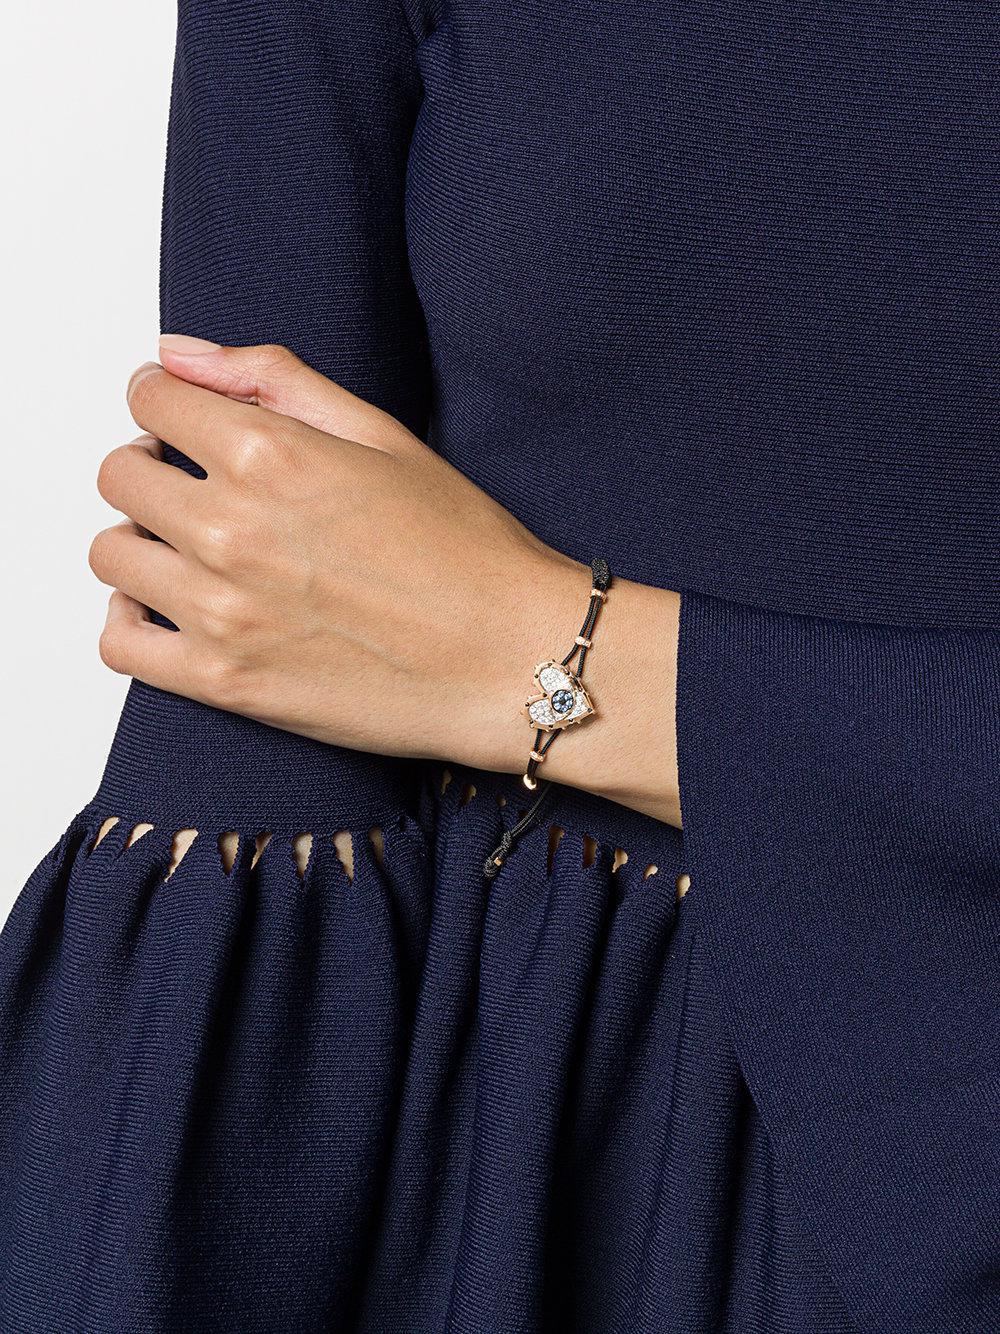 3a2d06f46 ... 18kt Rose Gold, Diamond And Sapphire Evil Eye Heart Charm Bracelet.  View fullscreen